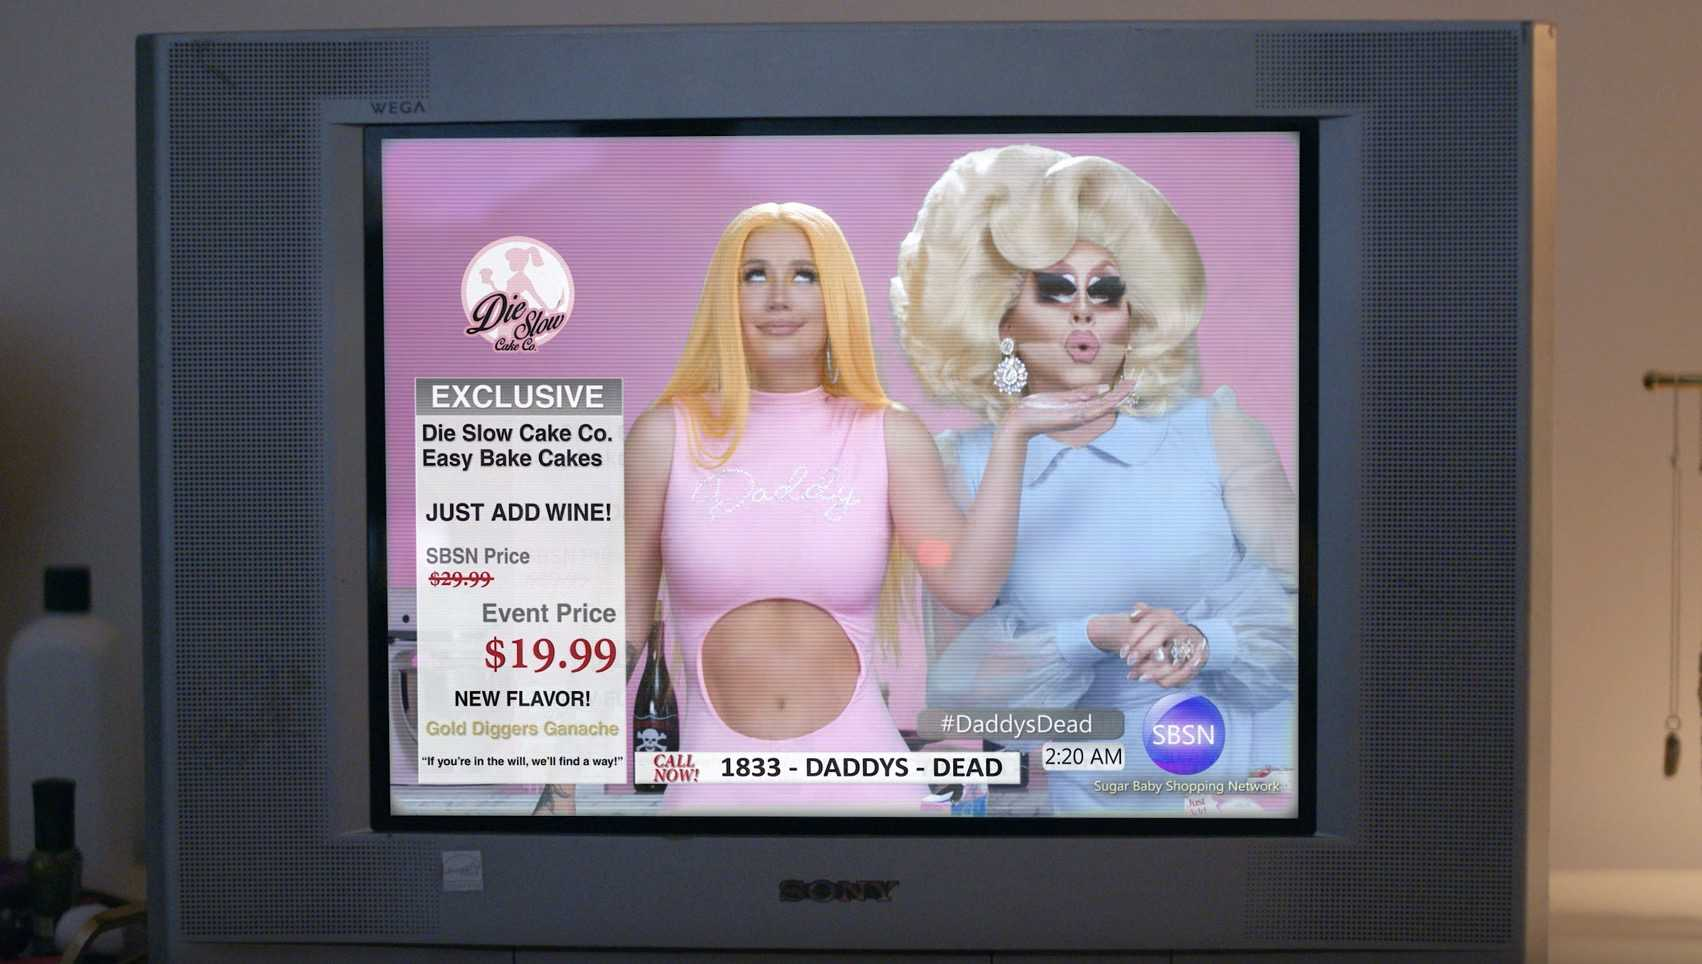 Trixie Mattel Started Iggy Azalea Video